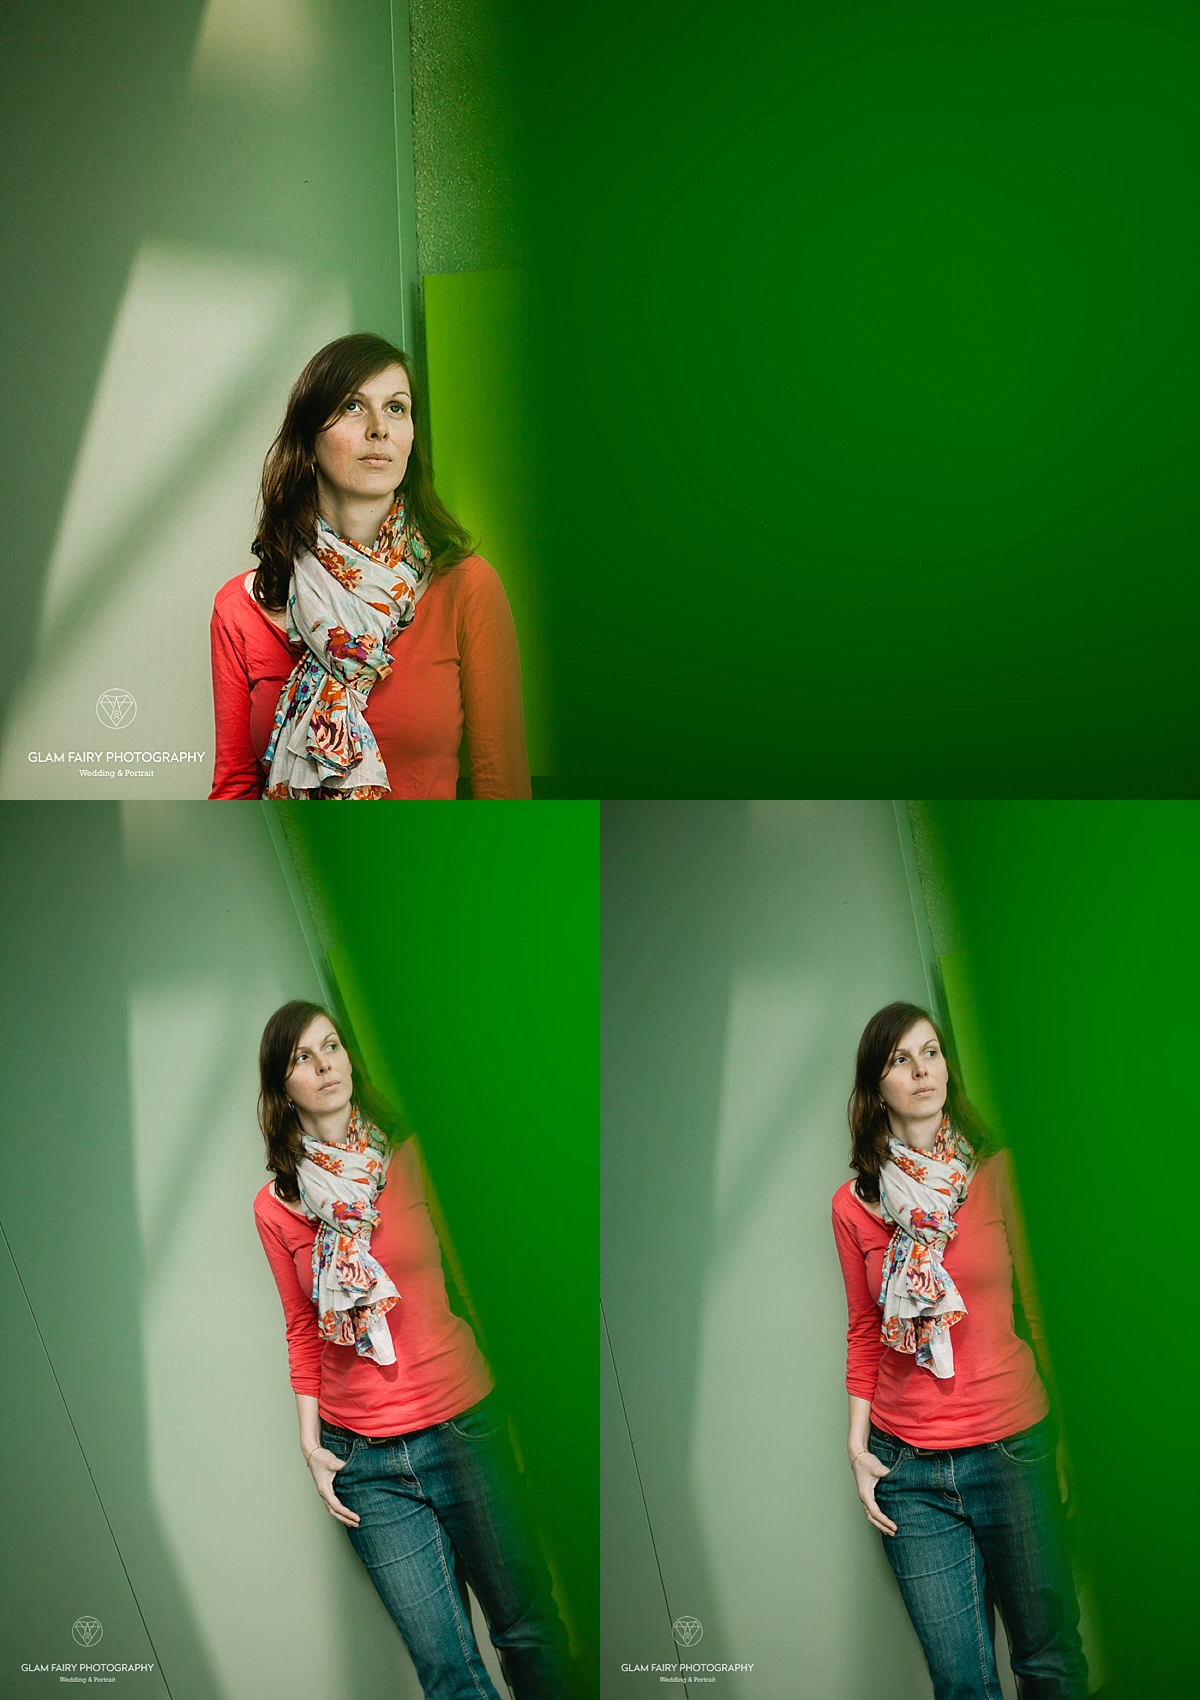 GlamFairyPhotography-seance-portrait-femme-les-docks-sandra_0005